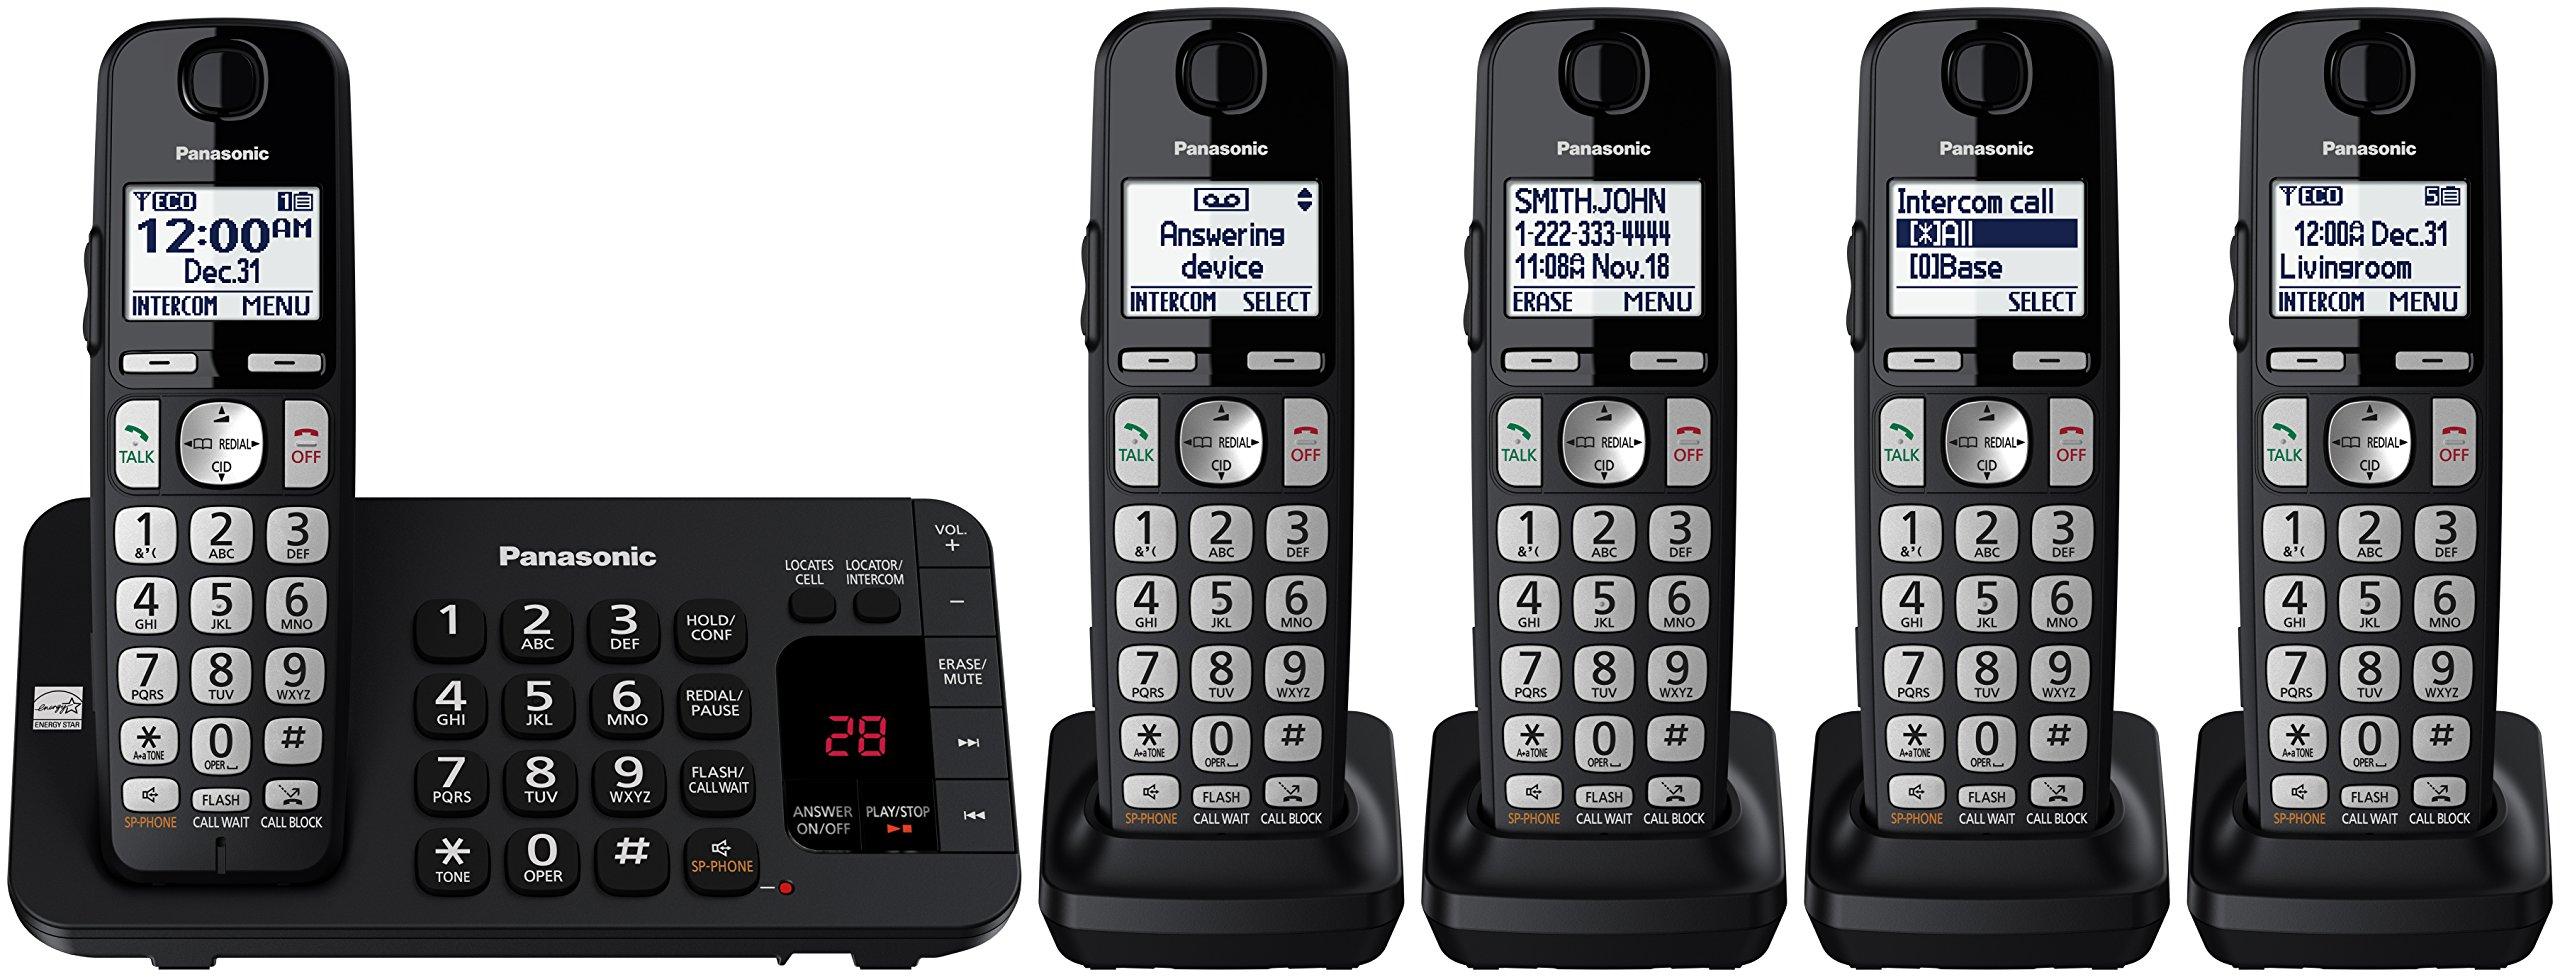 Panasonic KX-TGE445B Cordless Phone with  Answering Machine- 5 Handsets by Panasonic